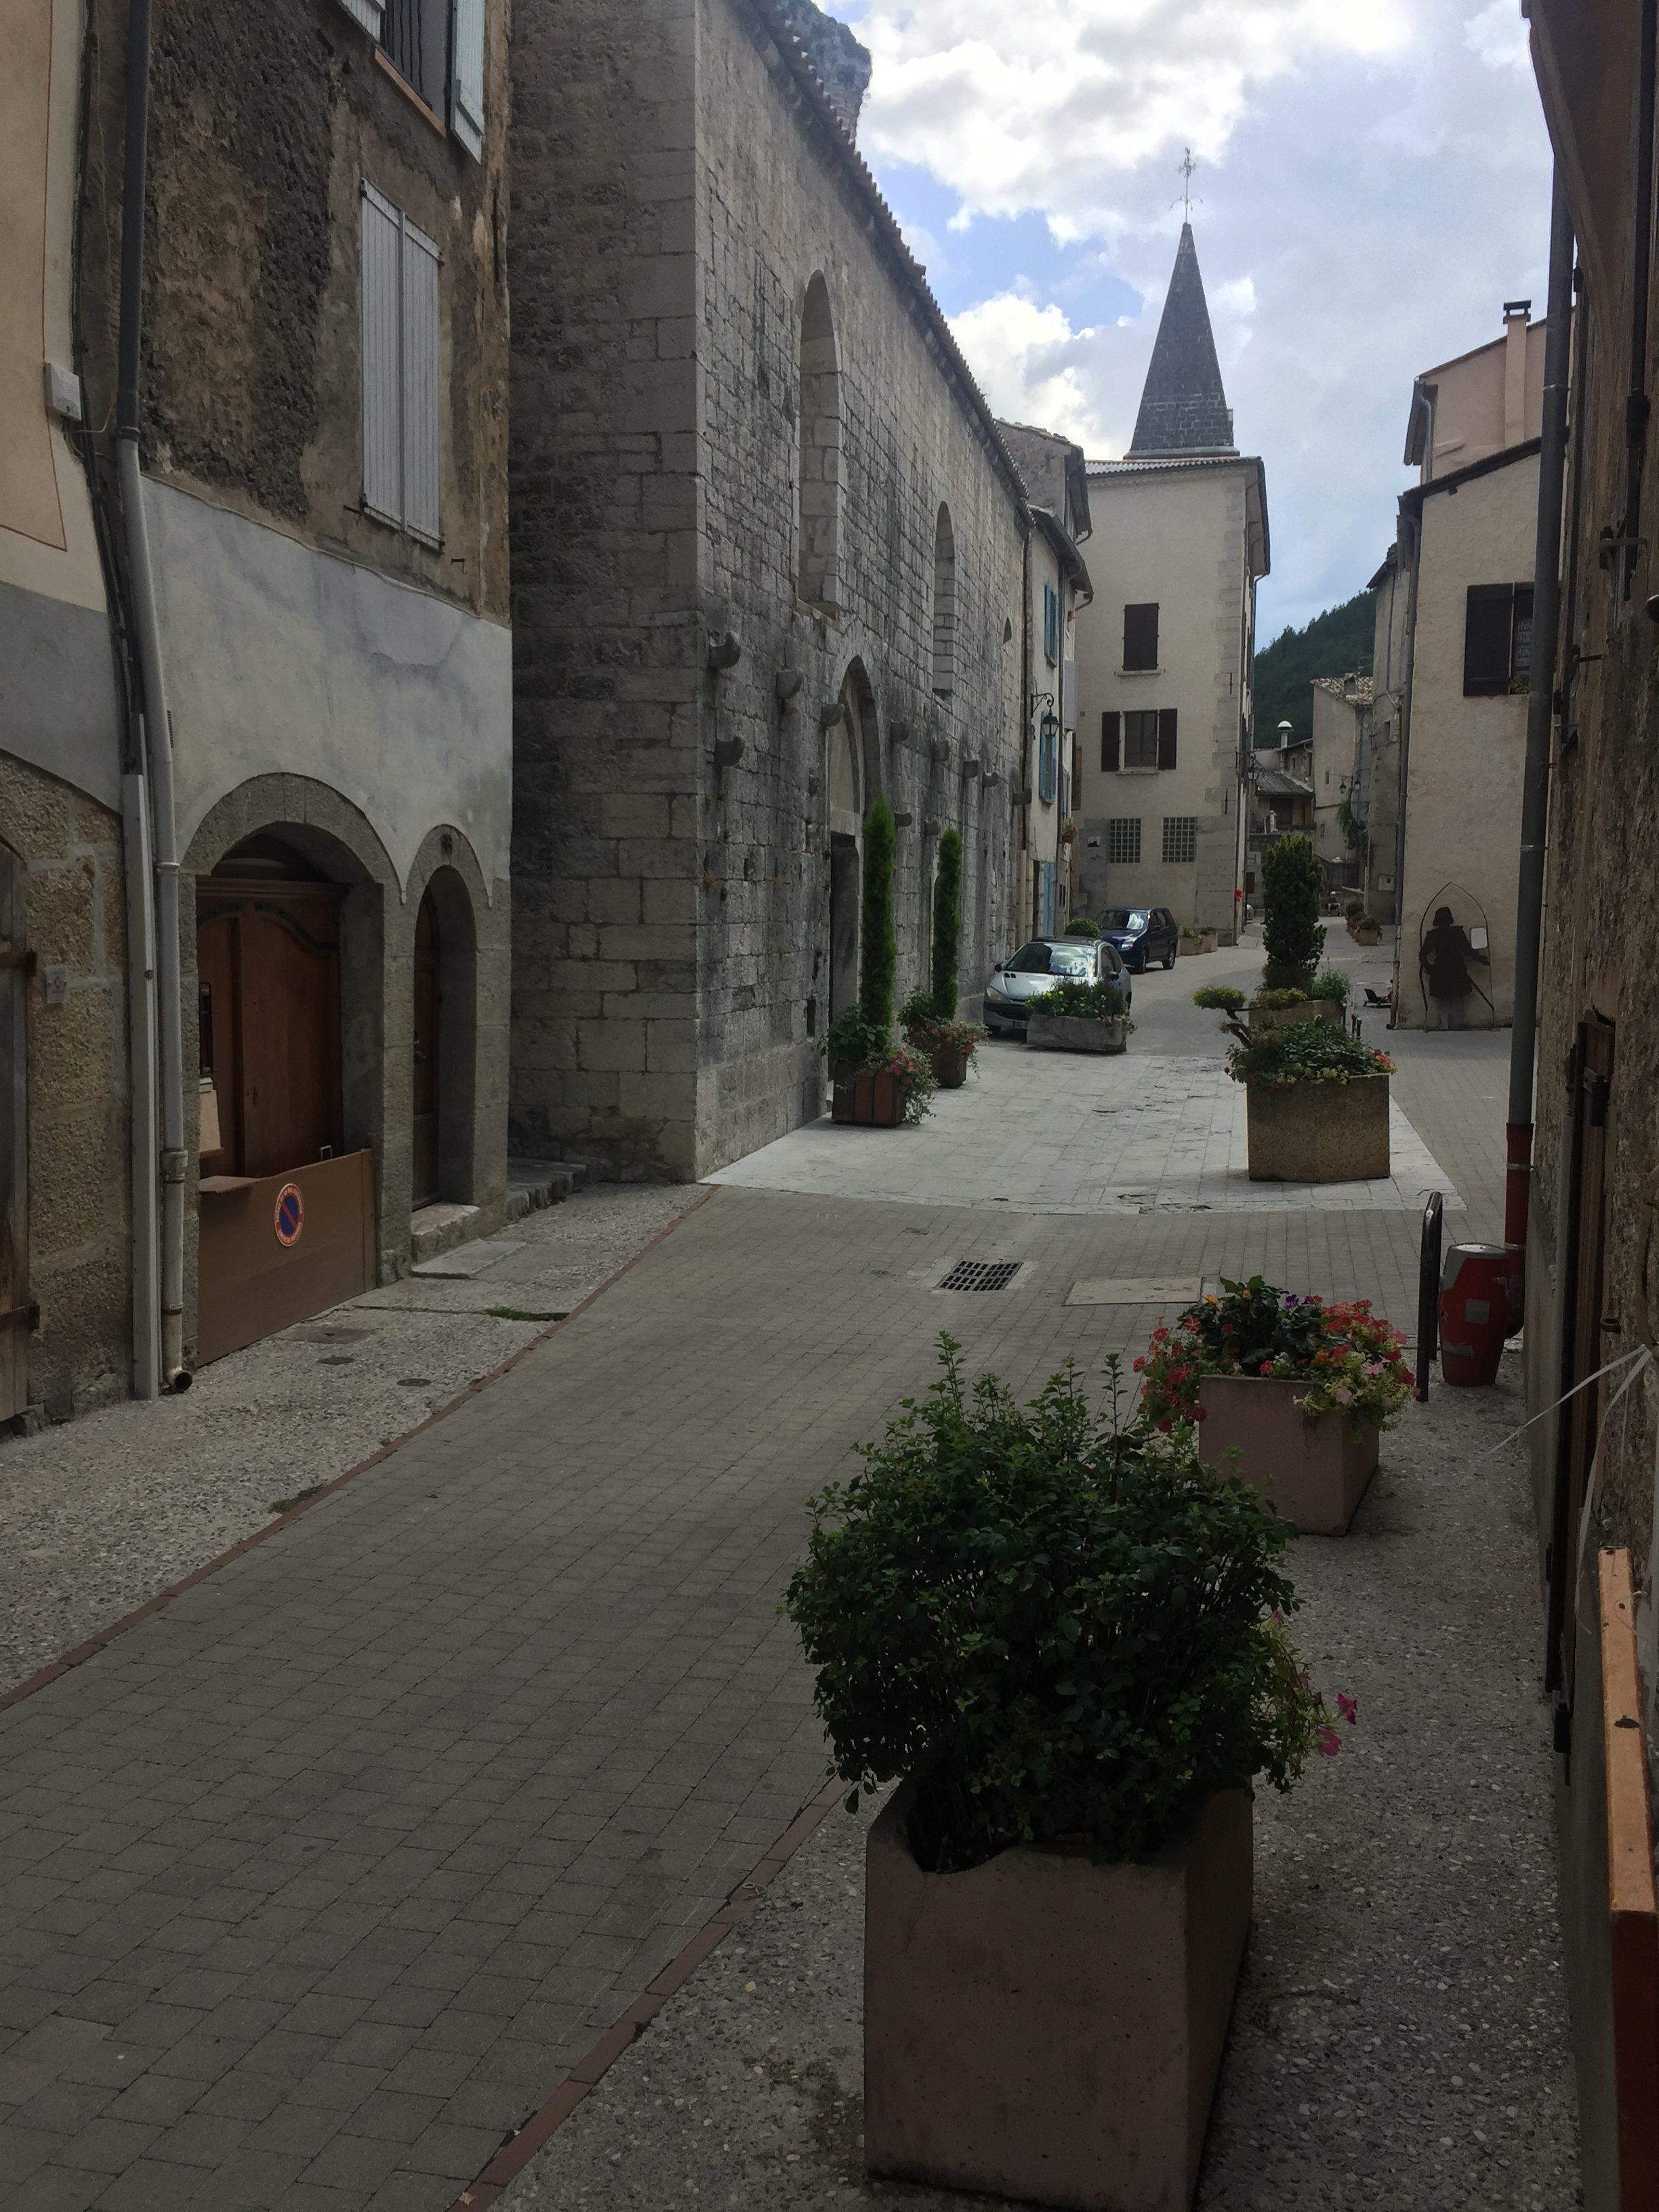 Streets of Castellane